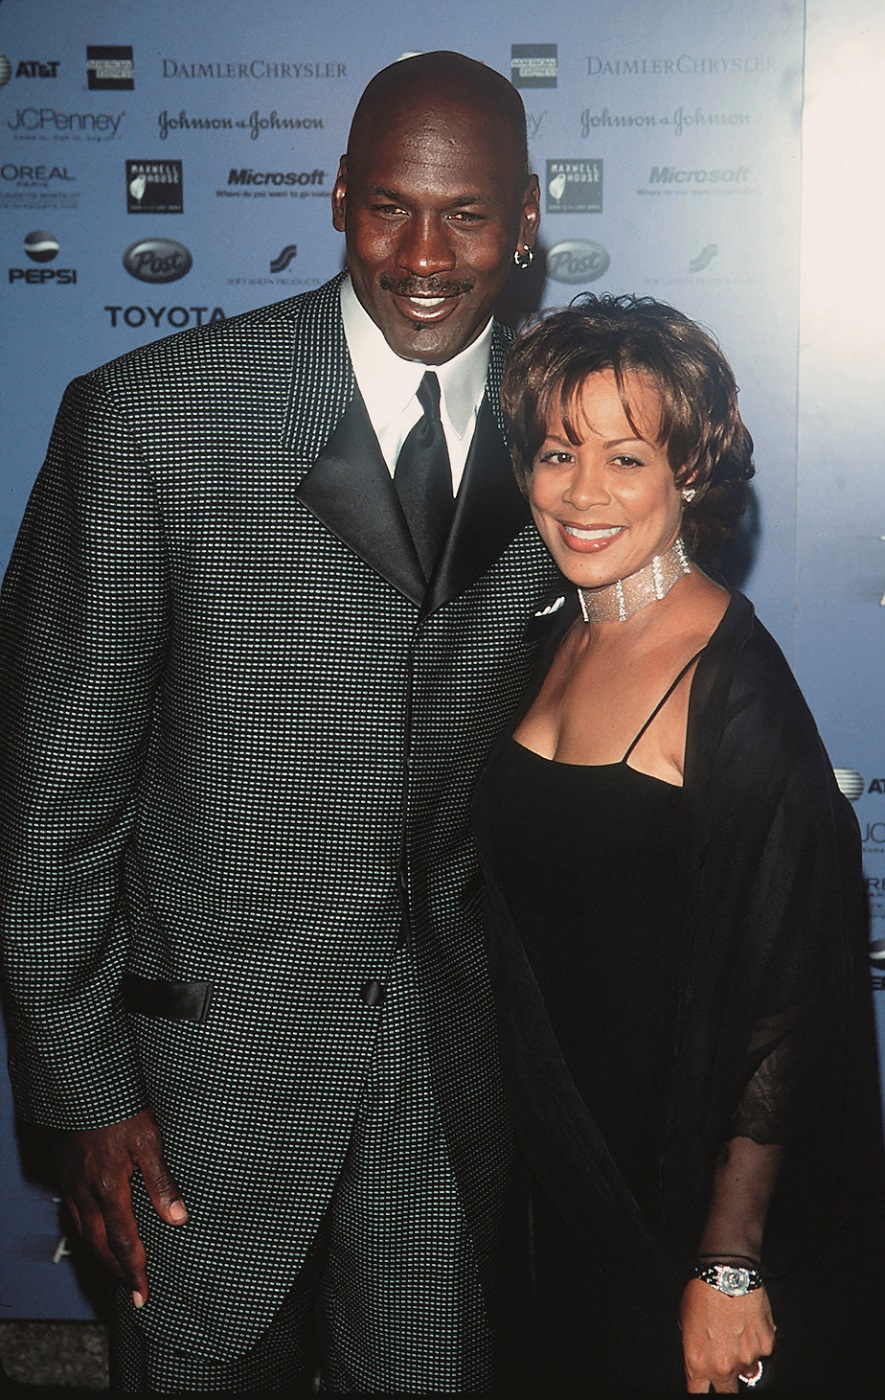 4/14/00 New York City  Essence Awards 2000 at Radio City Music Hall.  Honoree Michael Jordan with wife Juanita.      Photo by Evan Agostini/ImageDirect